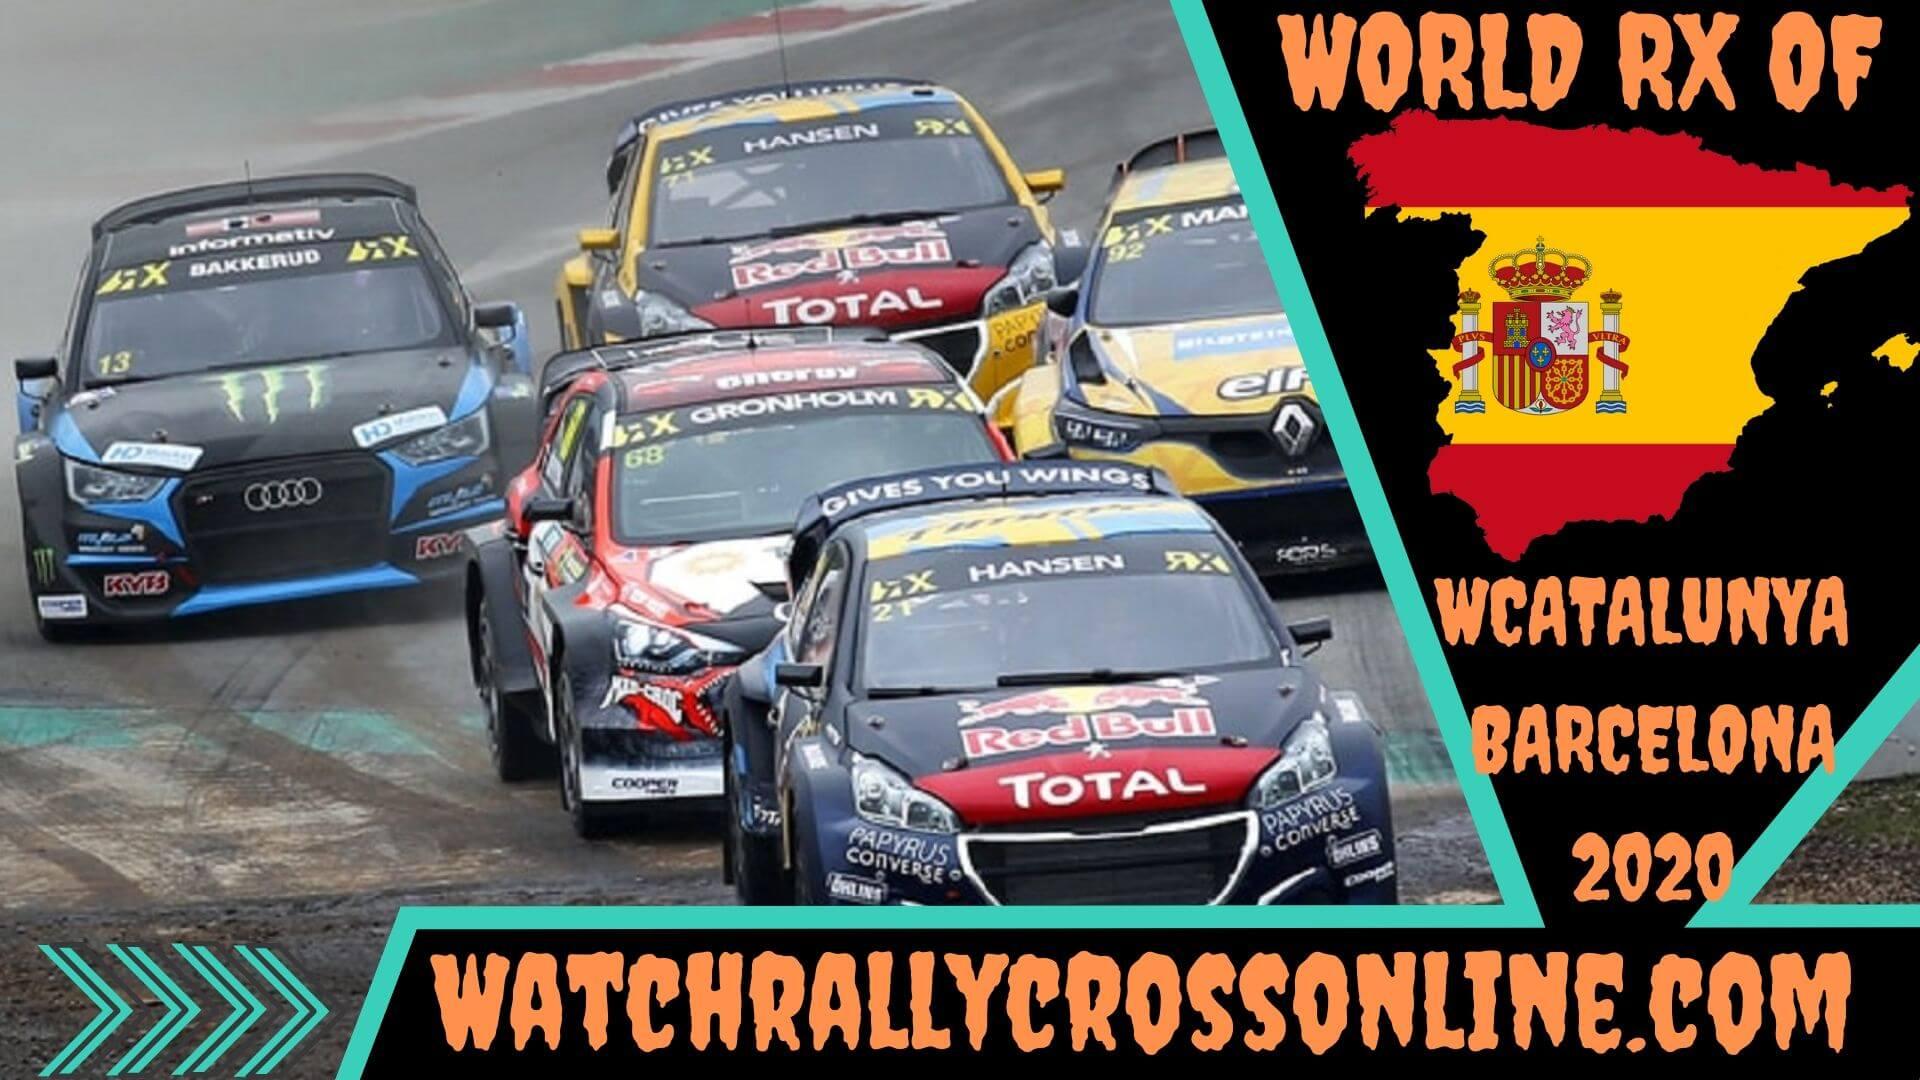 World Rallycross of Barcelona Spain Live Stream 2020 | Round 1